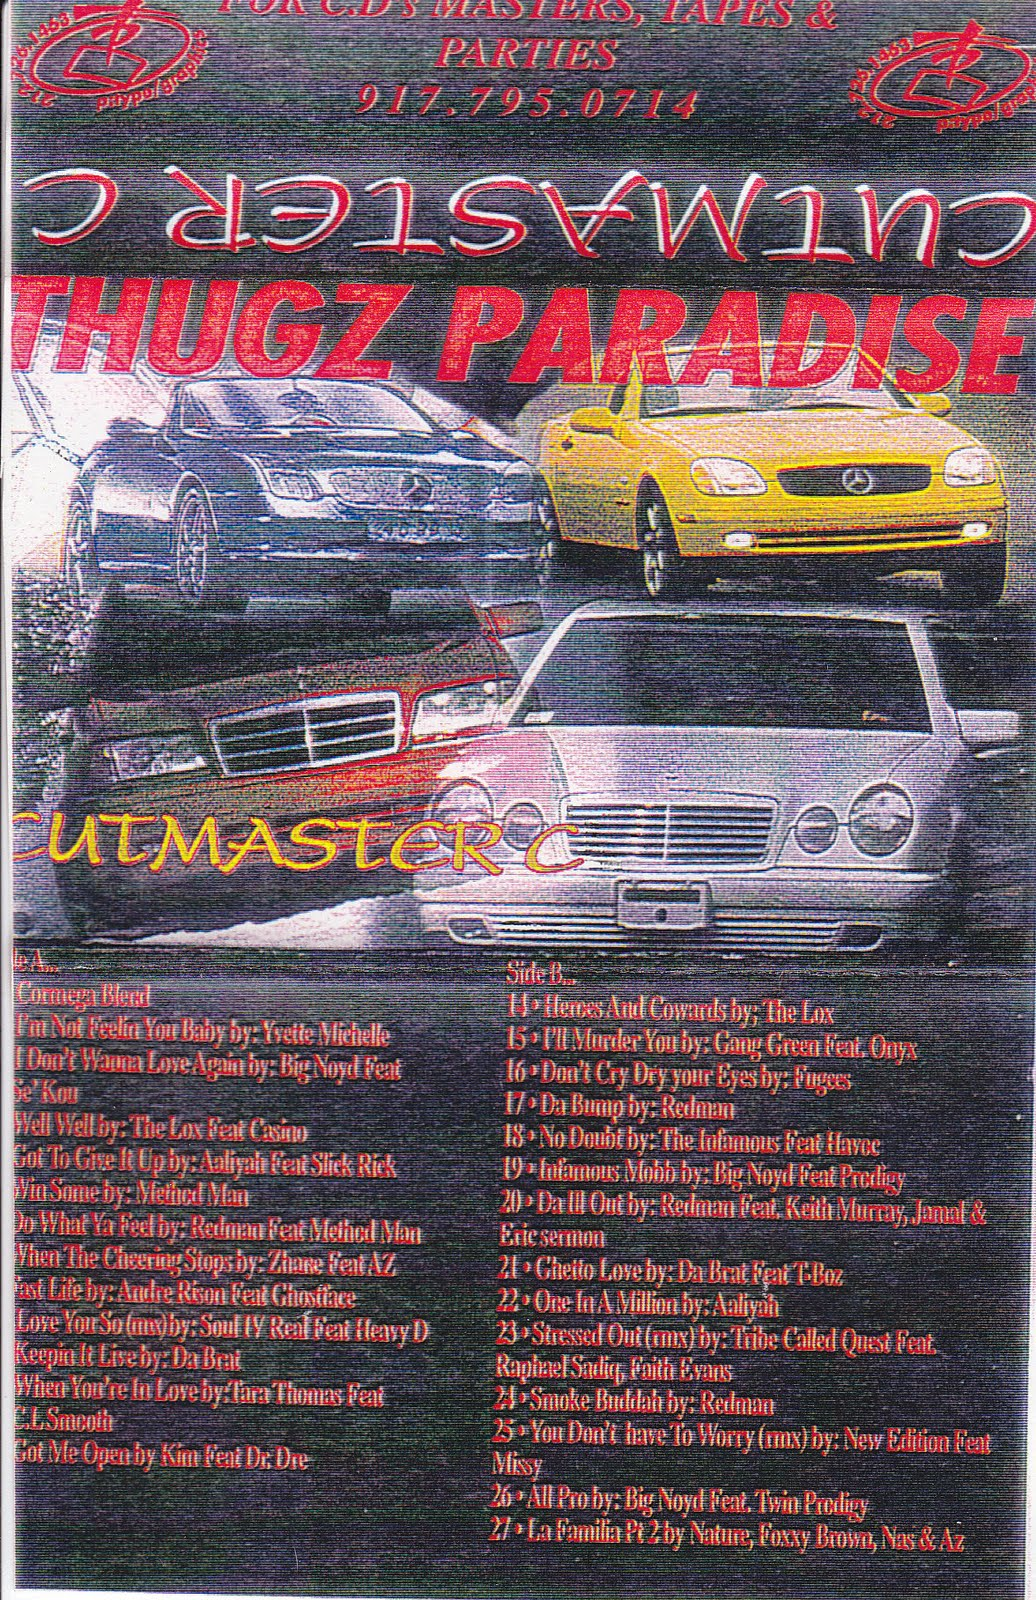 00-cutmaster_c-thugz_paradise-%2528tape%2529-1996-cover.jpg